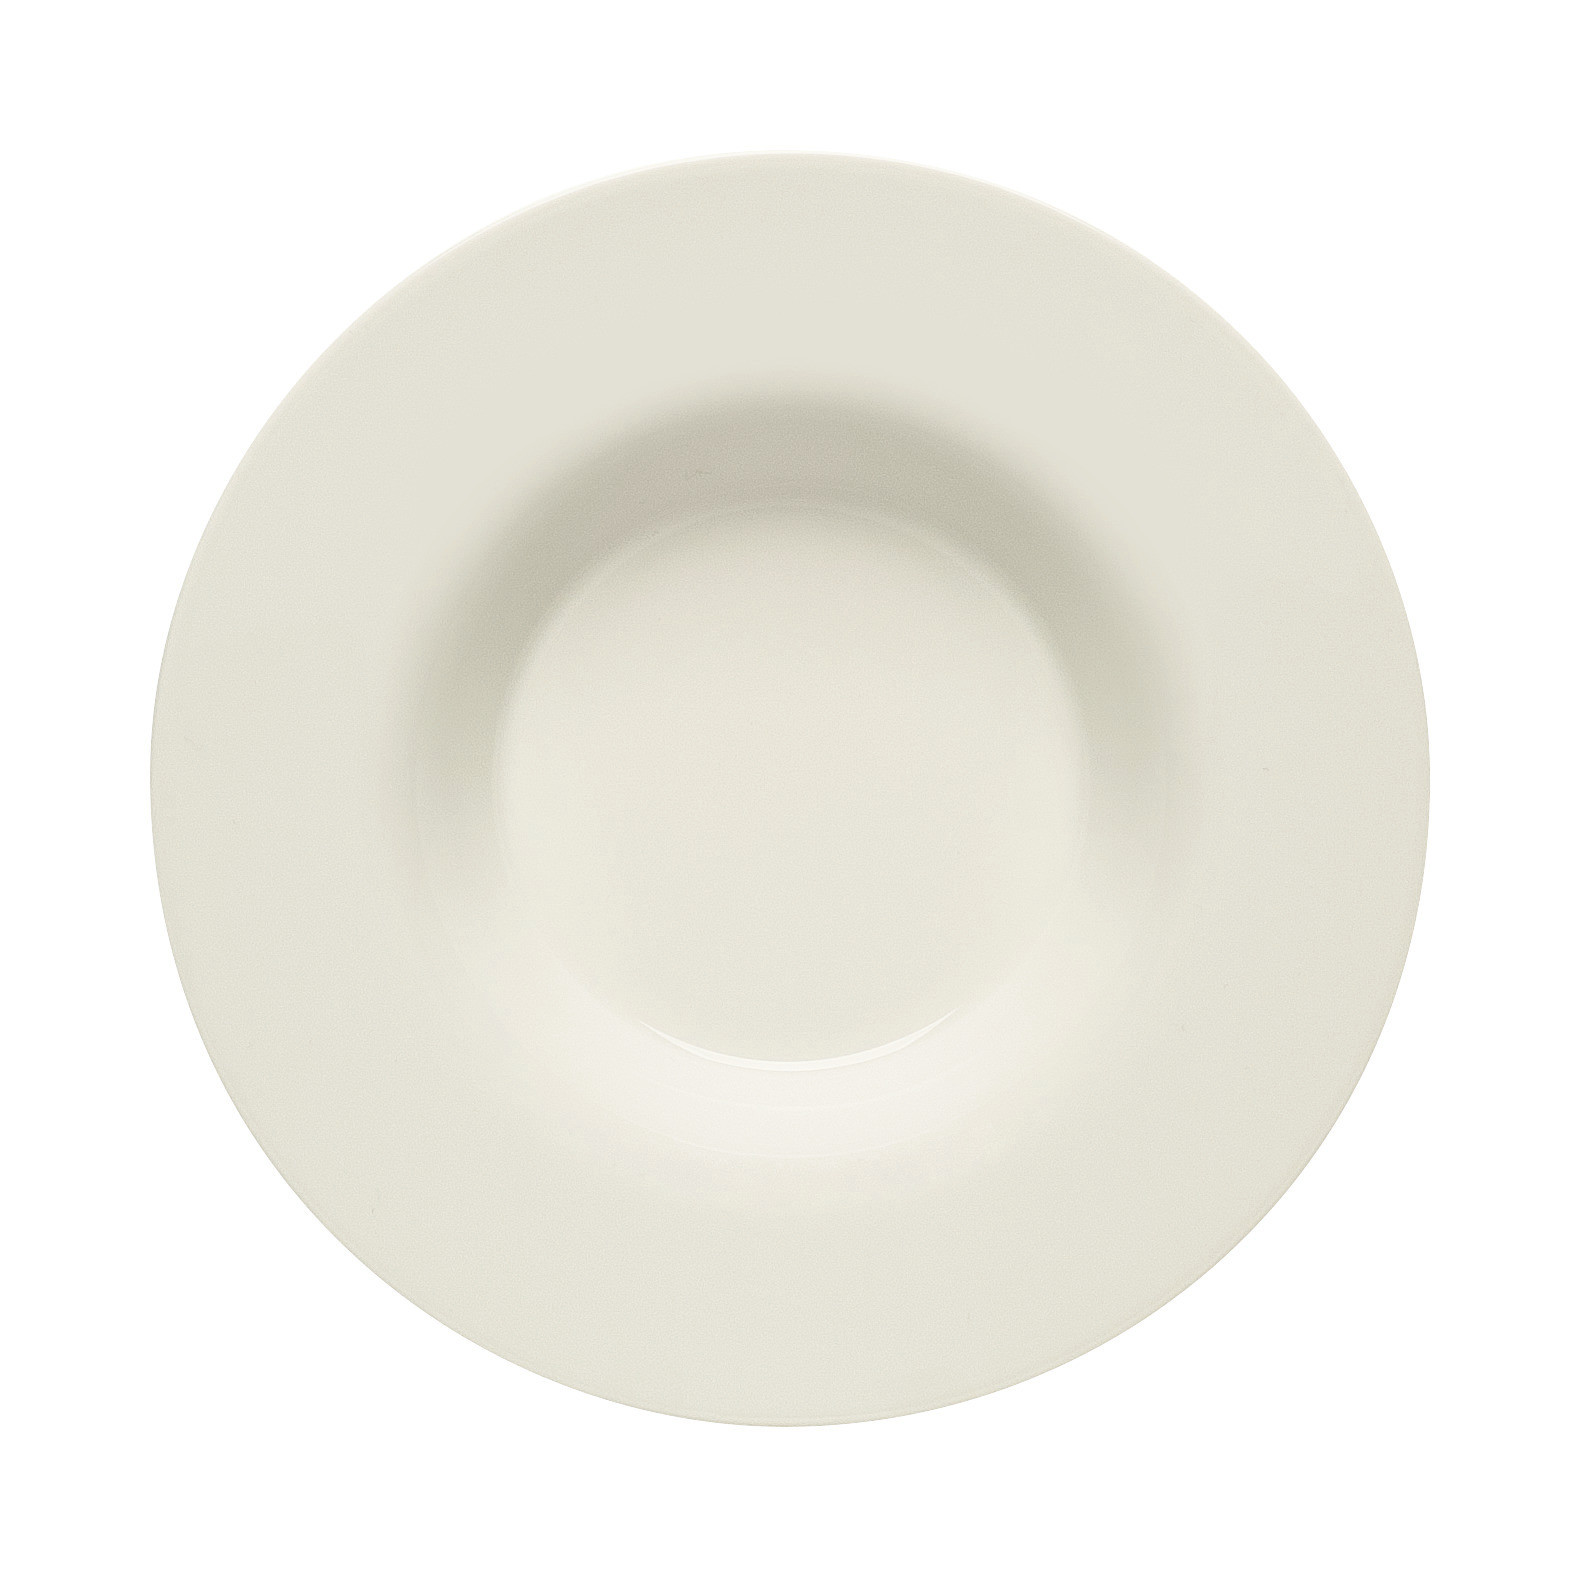 Purity, Teller tief mit Fahne ø 238 mm / 0,32 l